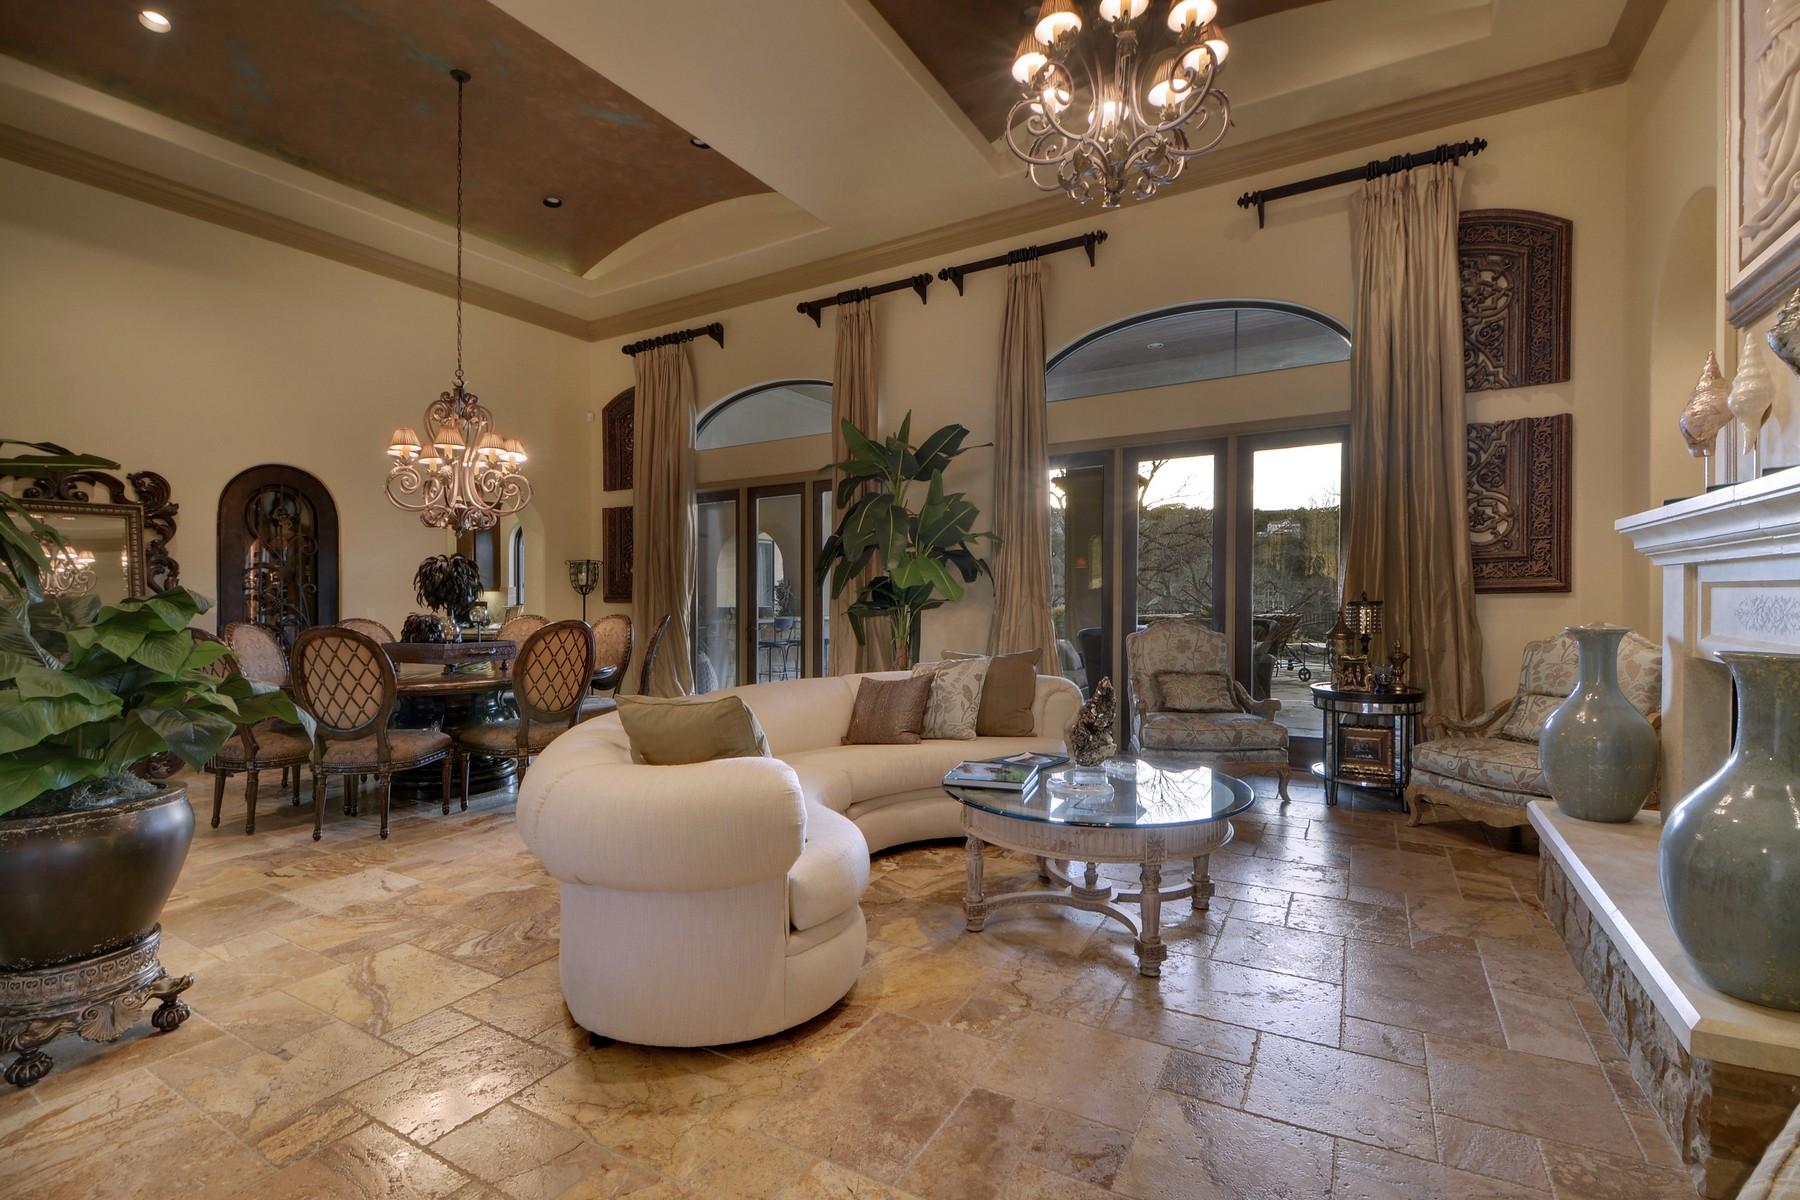 Additional photo for property listing at Lake Austin Estate on 5.8 acres 14300 Flat Top Ranch Rd Austin, Texas 78732 Estados Unidos